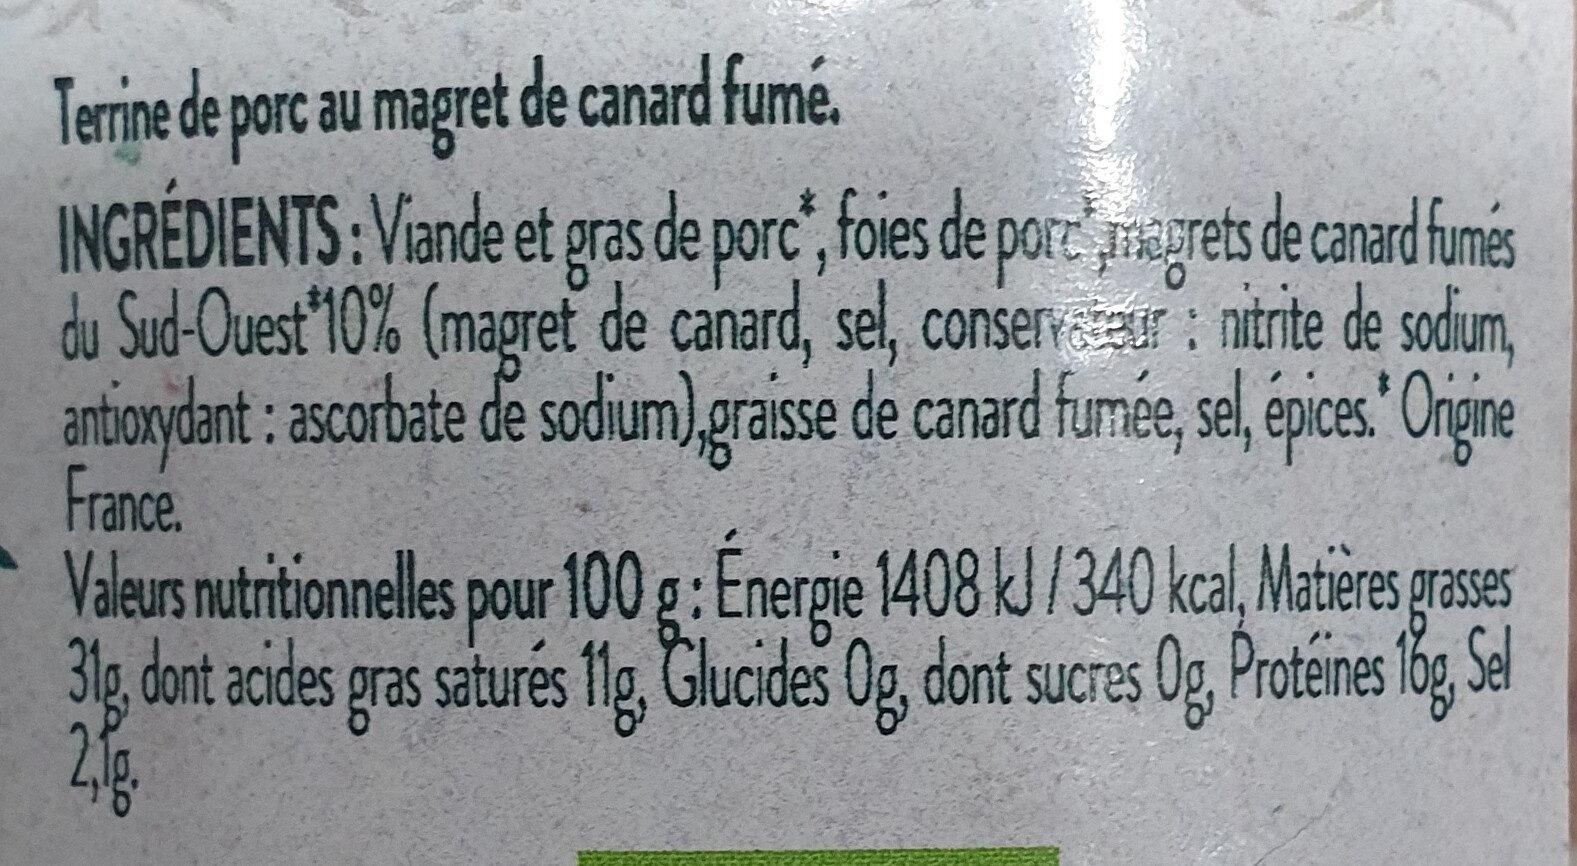 clos saint sozy - Ingredients - fr